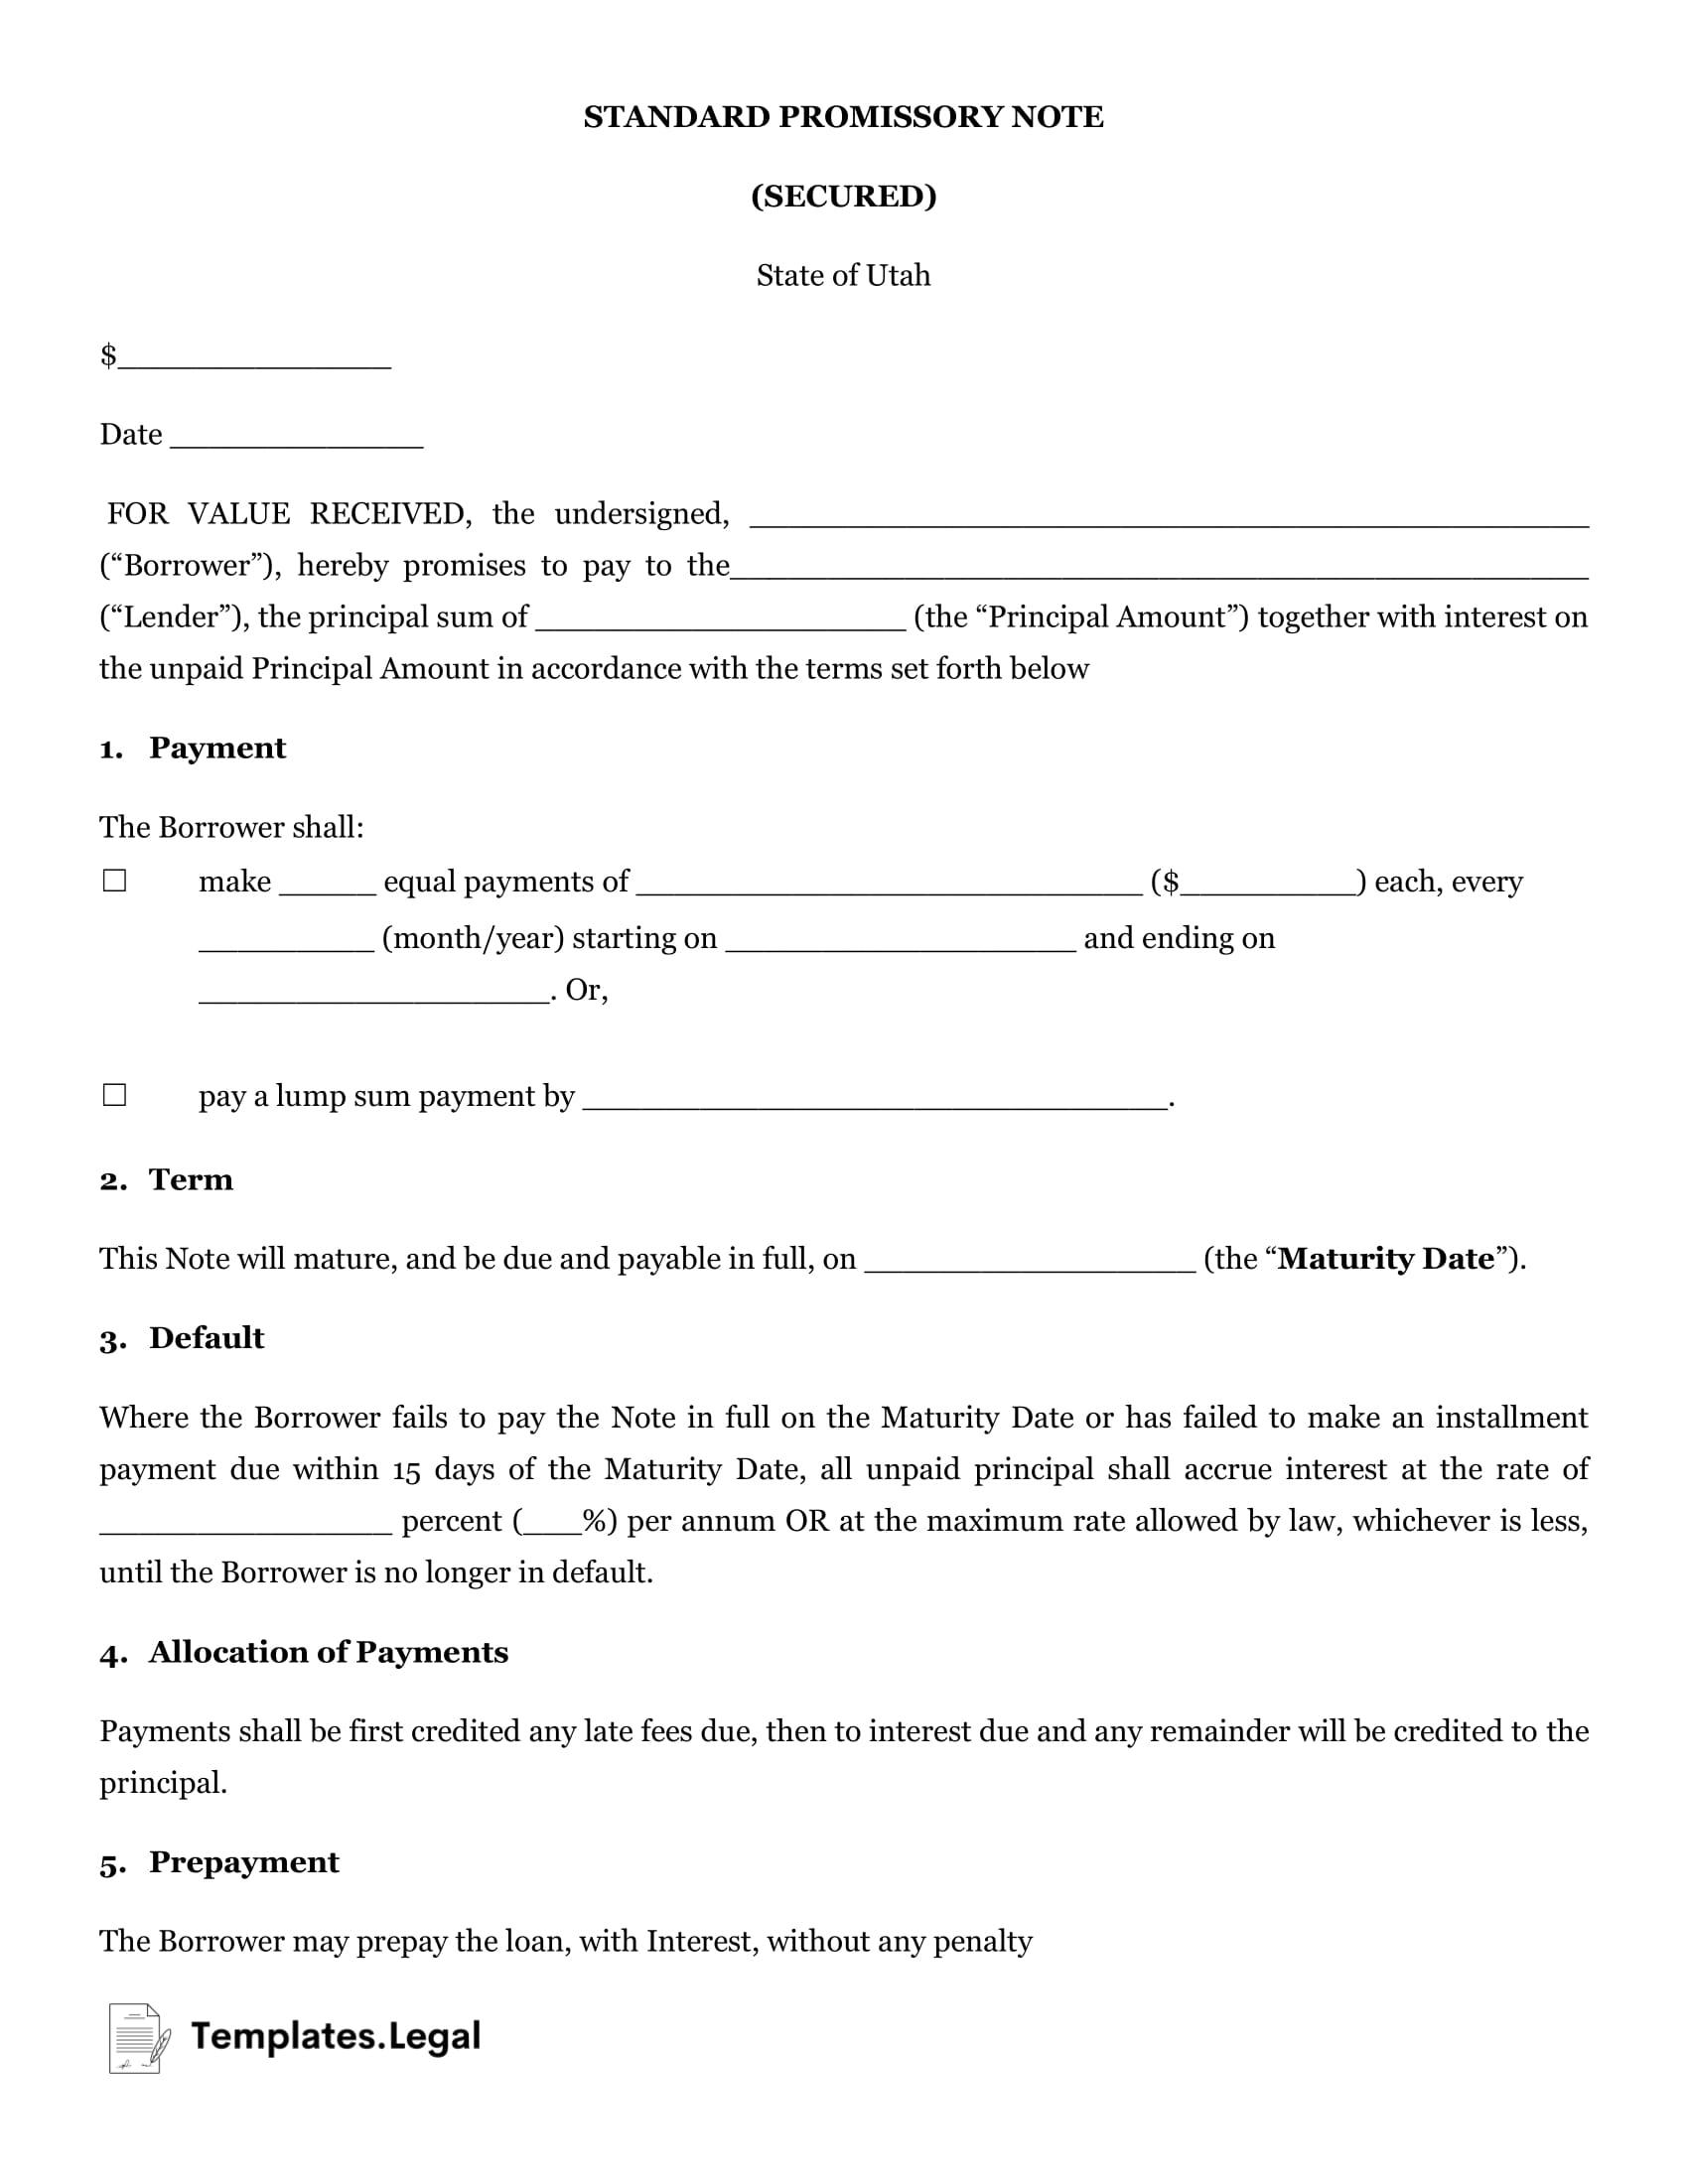 Utah Secured Promissory Note - Templates.Legal